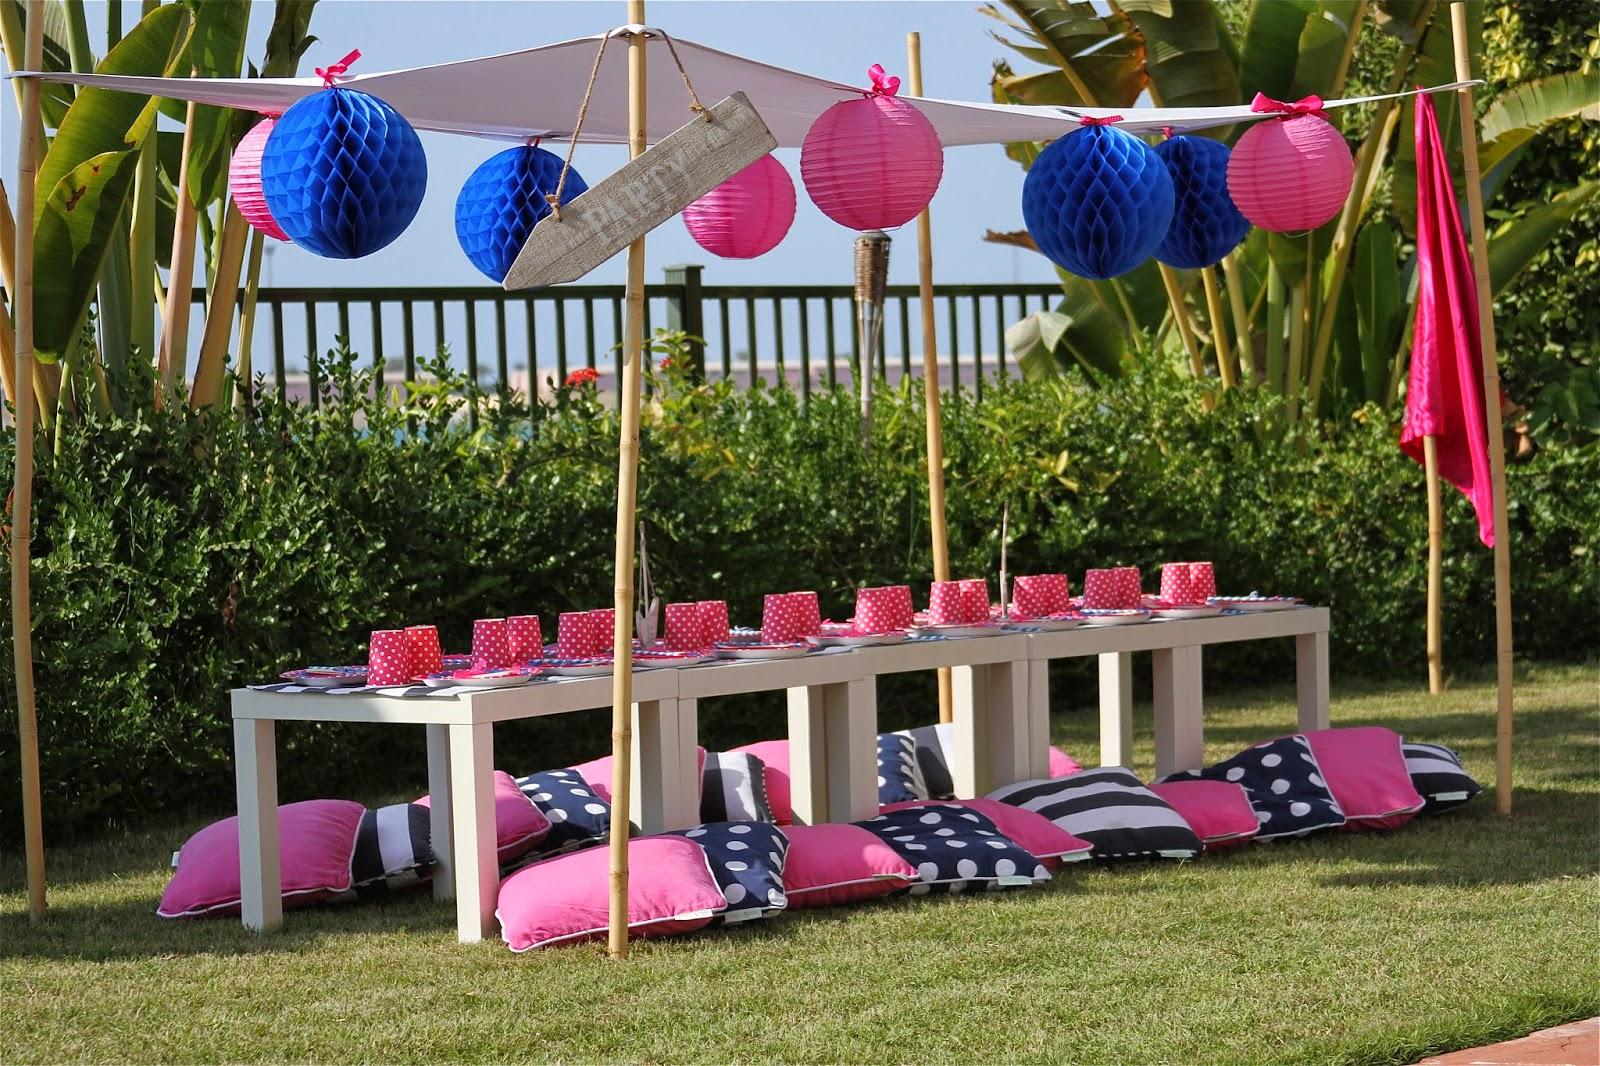 Thaynara lopes blog ideias para festa na piscina poolparty for Party in piscina